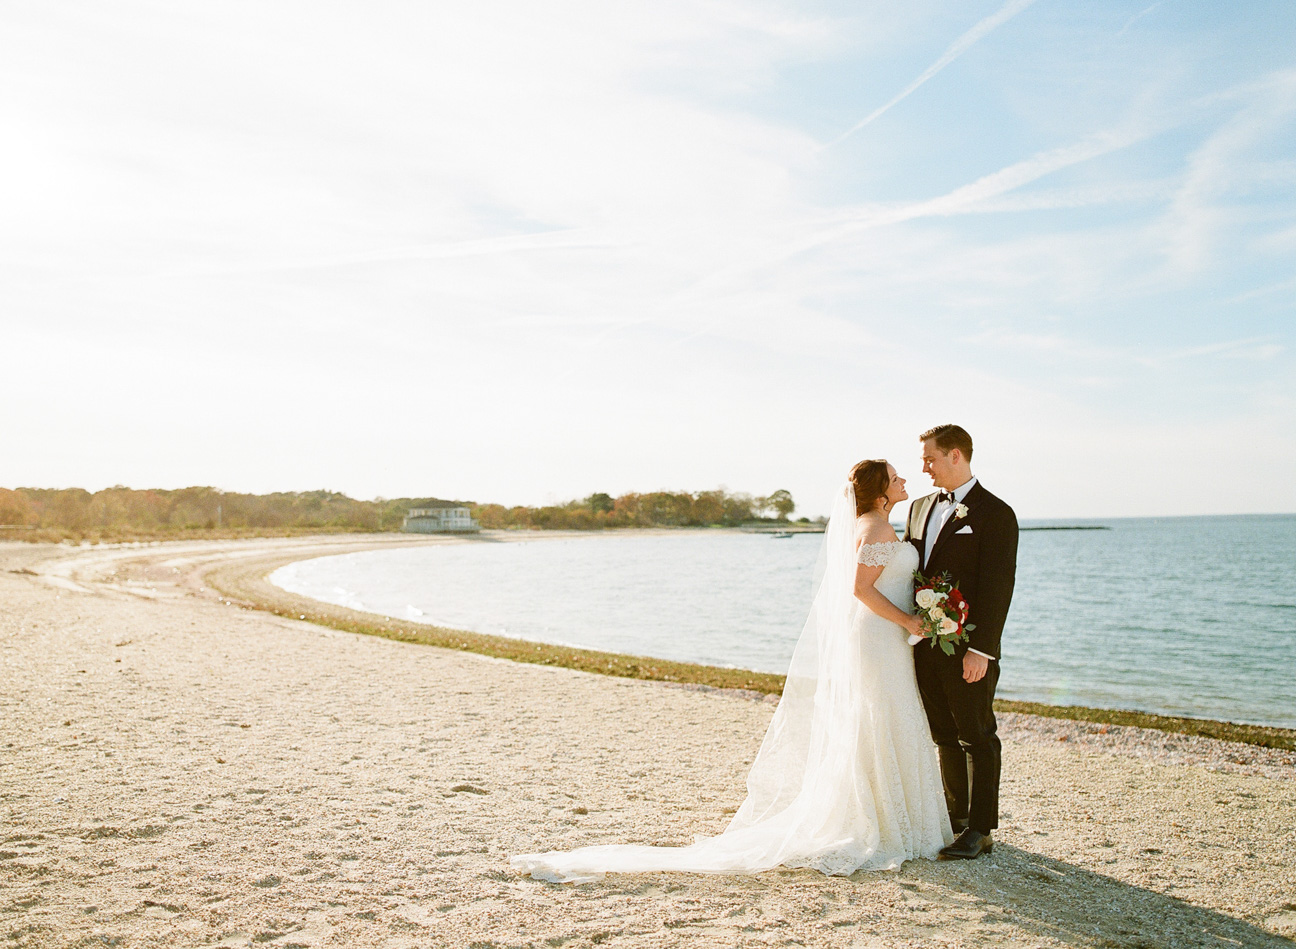 KarenHillPhotography-Forlines-Wedding-0255.jpg